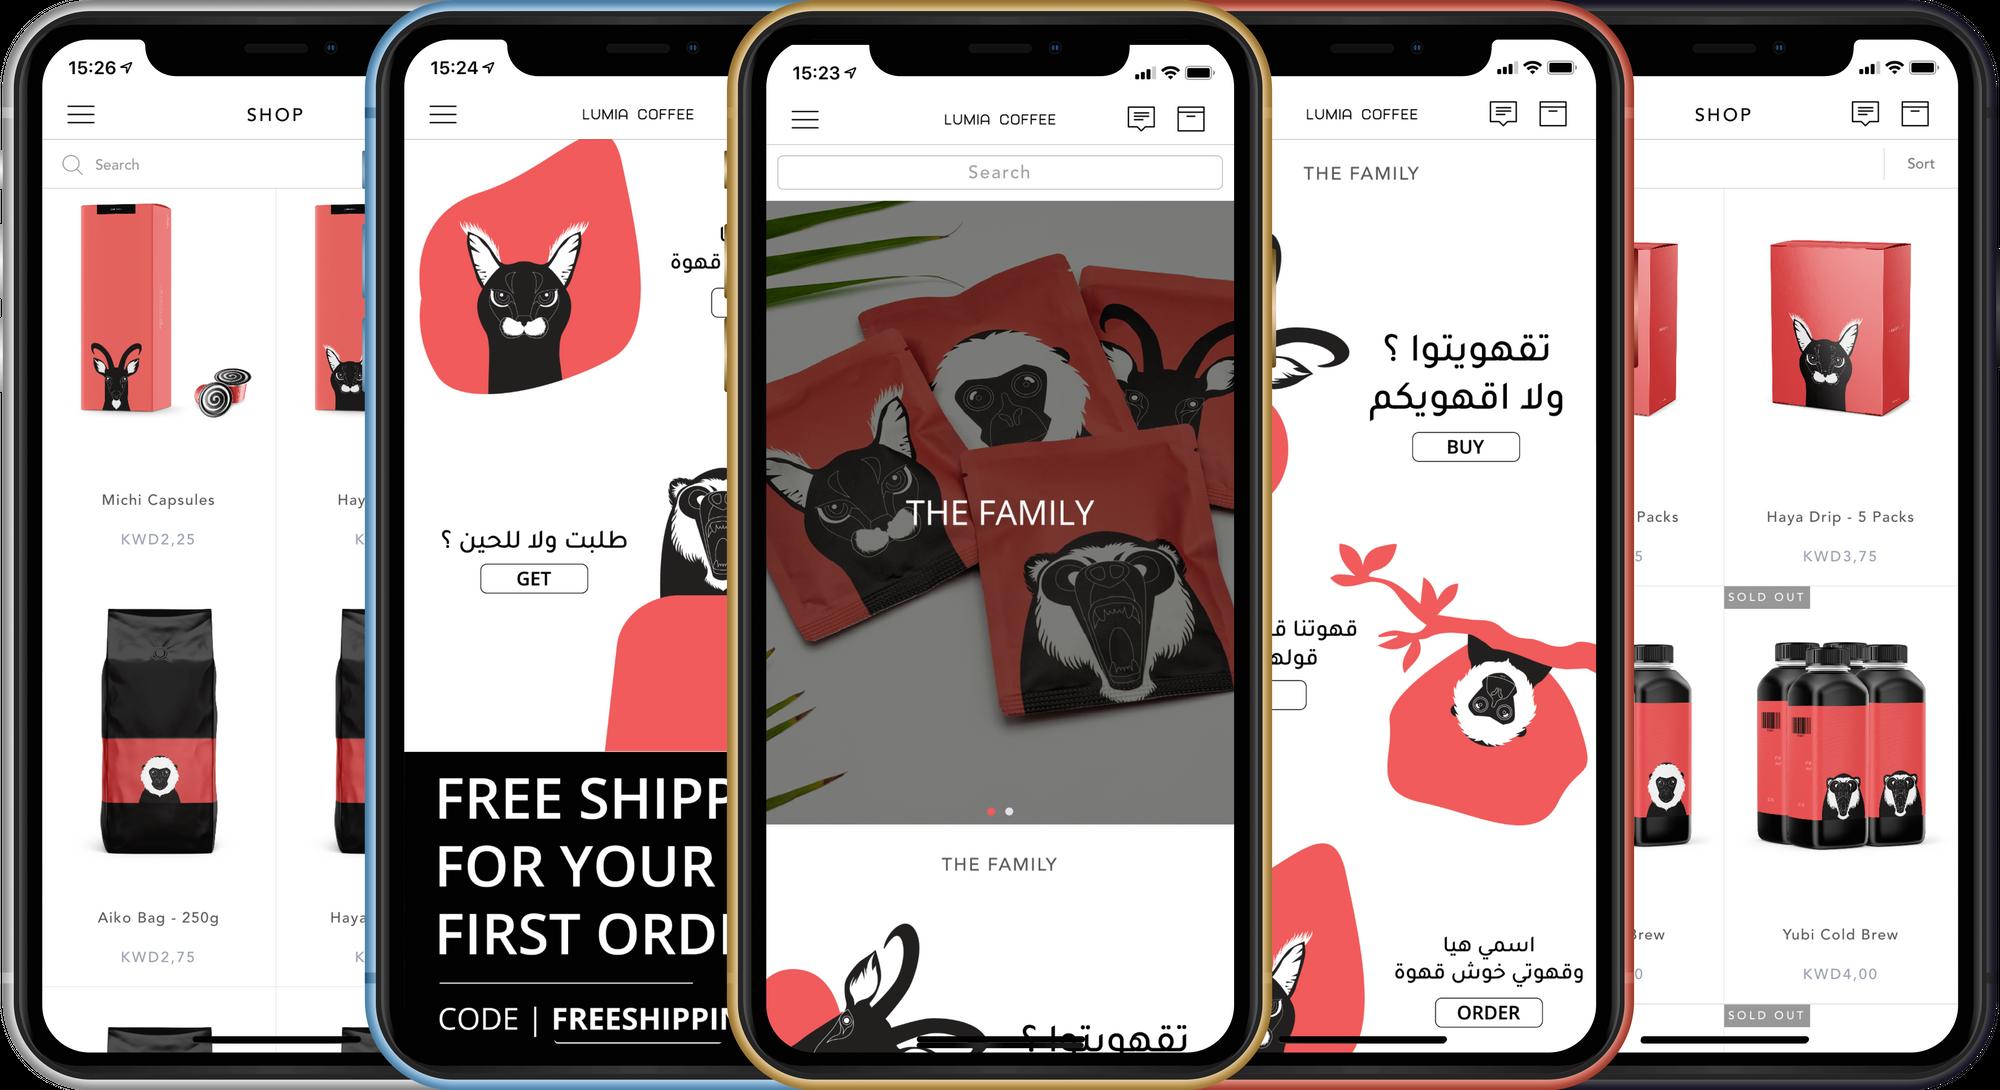 Lumia Coffee Mobile App Screenshots